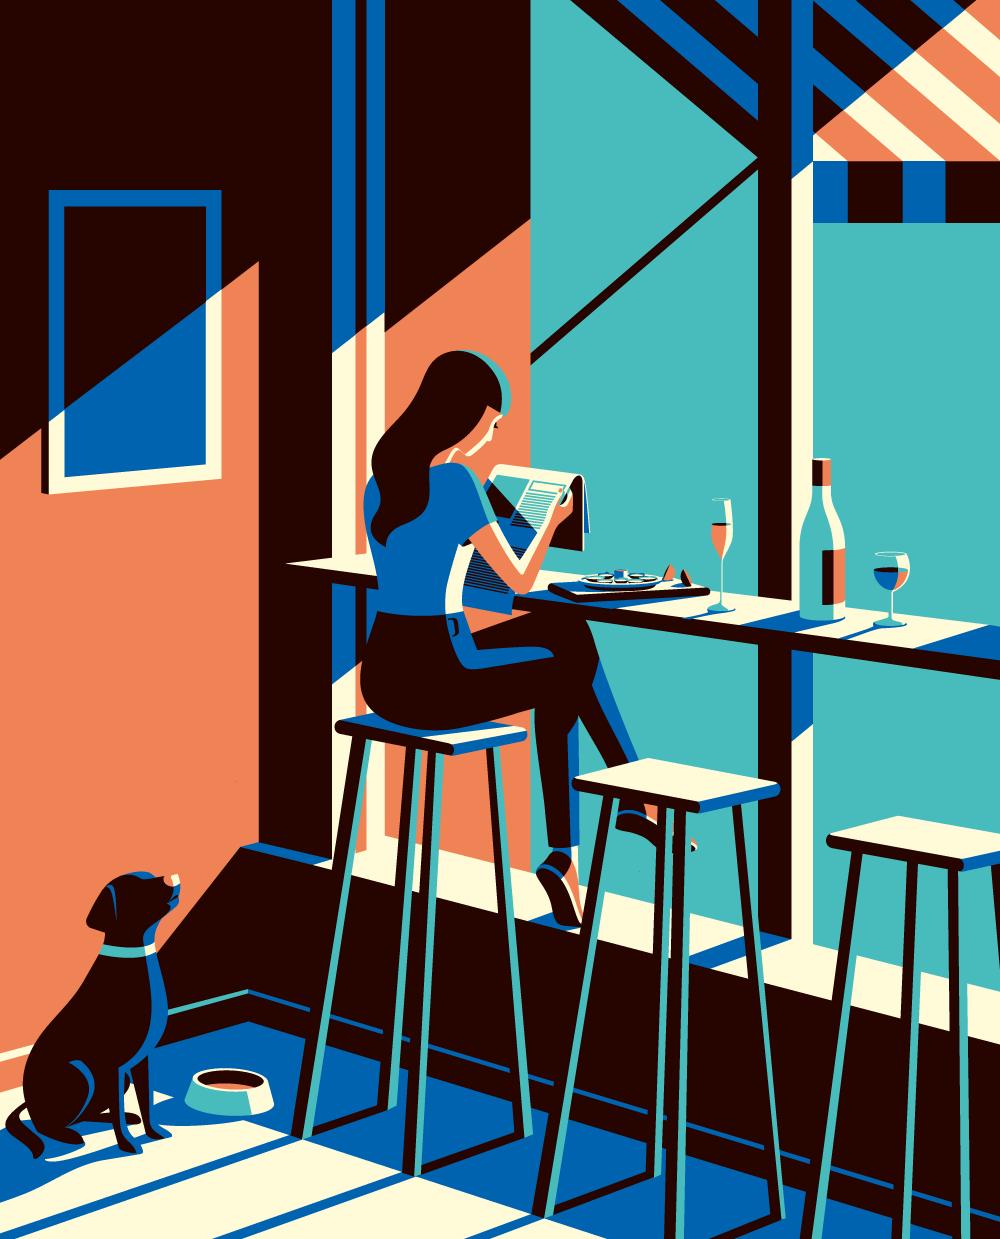 malika favre ilustration